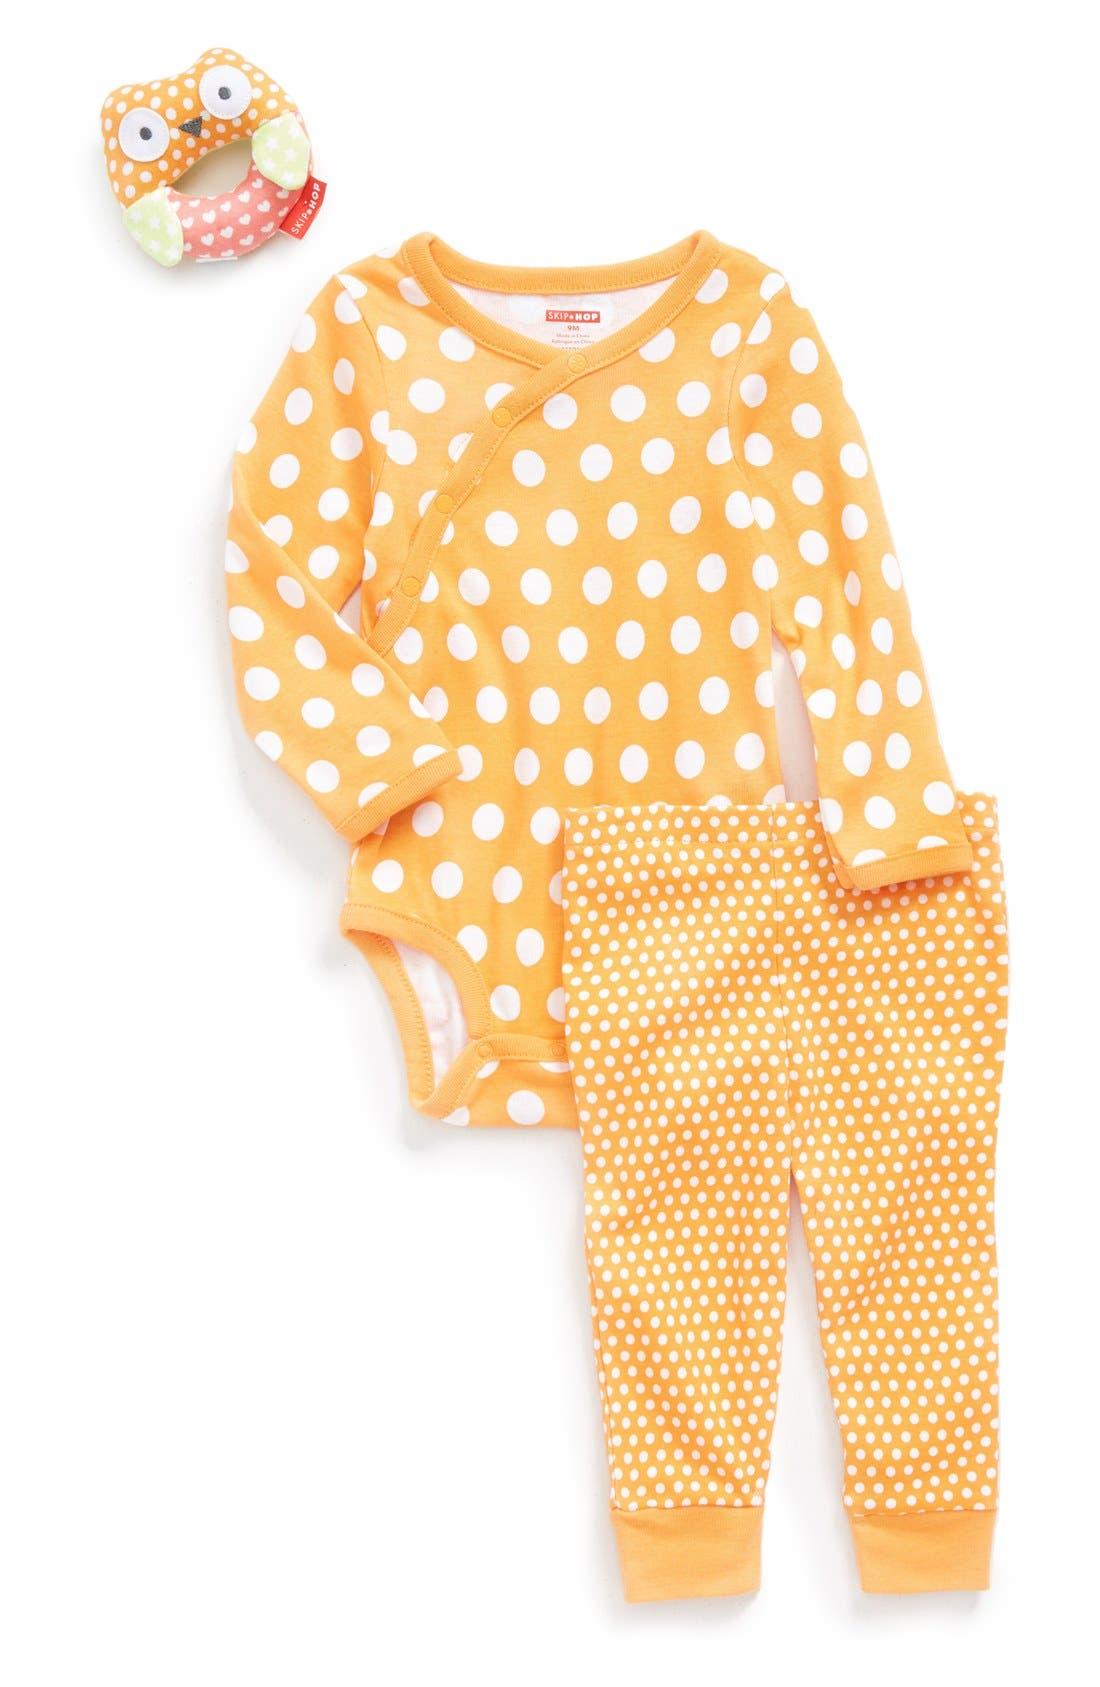 SKIP HOP,                             Long Sleeve Wrap Bodysuit, Pants & Rattle,                             Main thumbnail 1, color,                             800